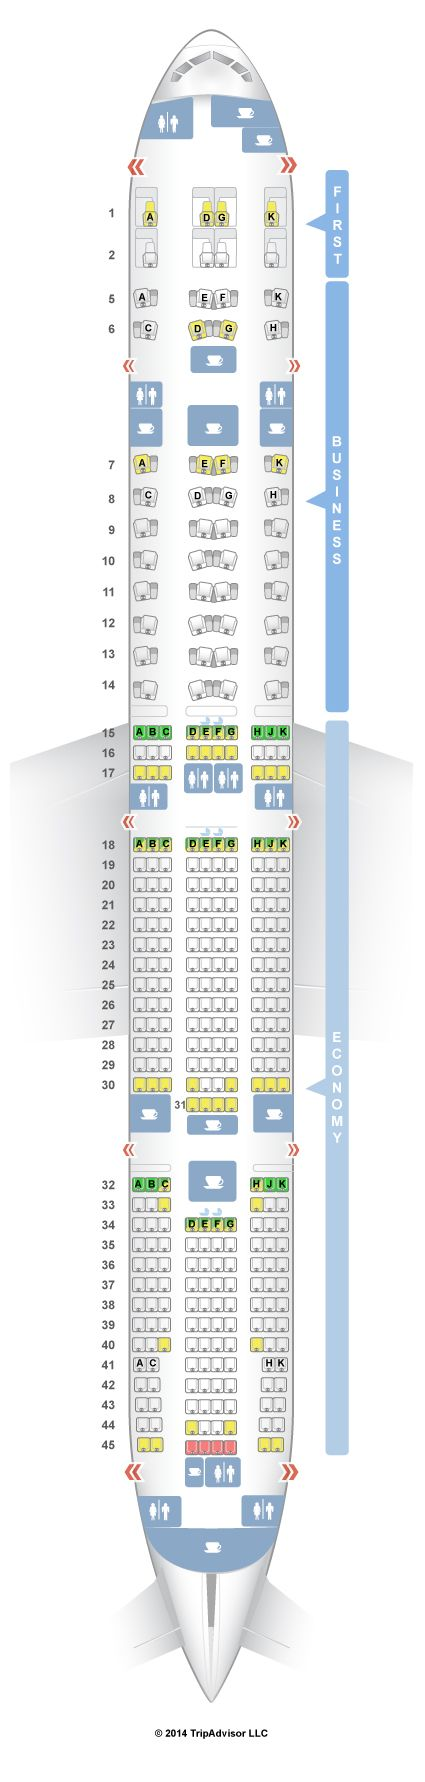 SeatGuru Seat Map Etihad Boeing 777-300ER (77W) Three Class